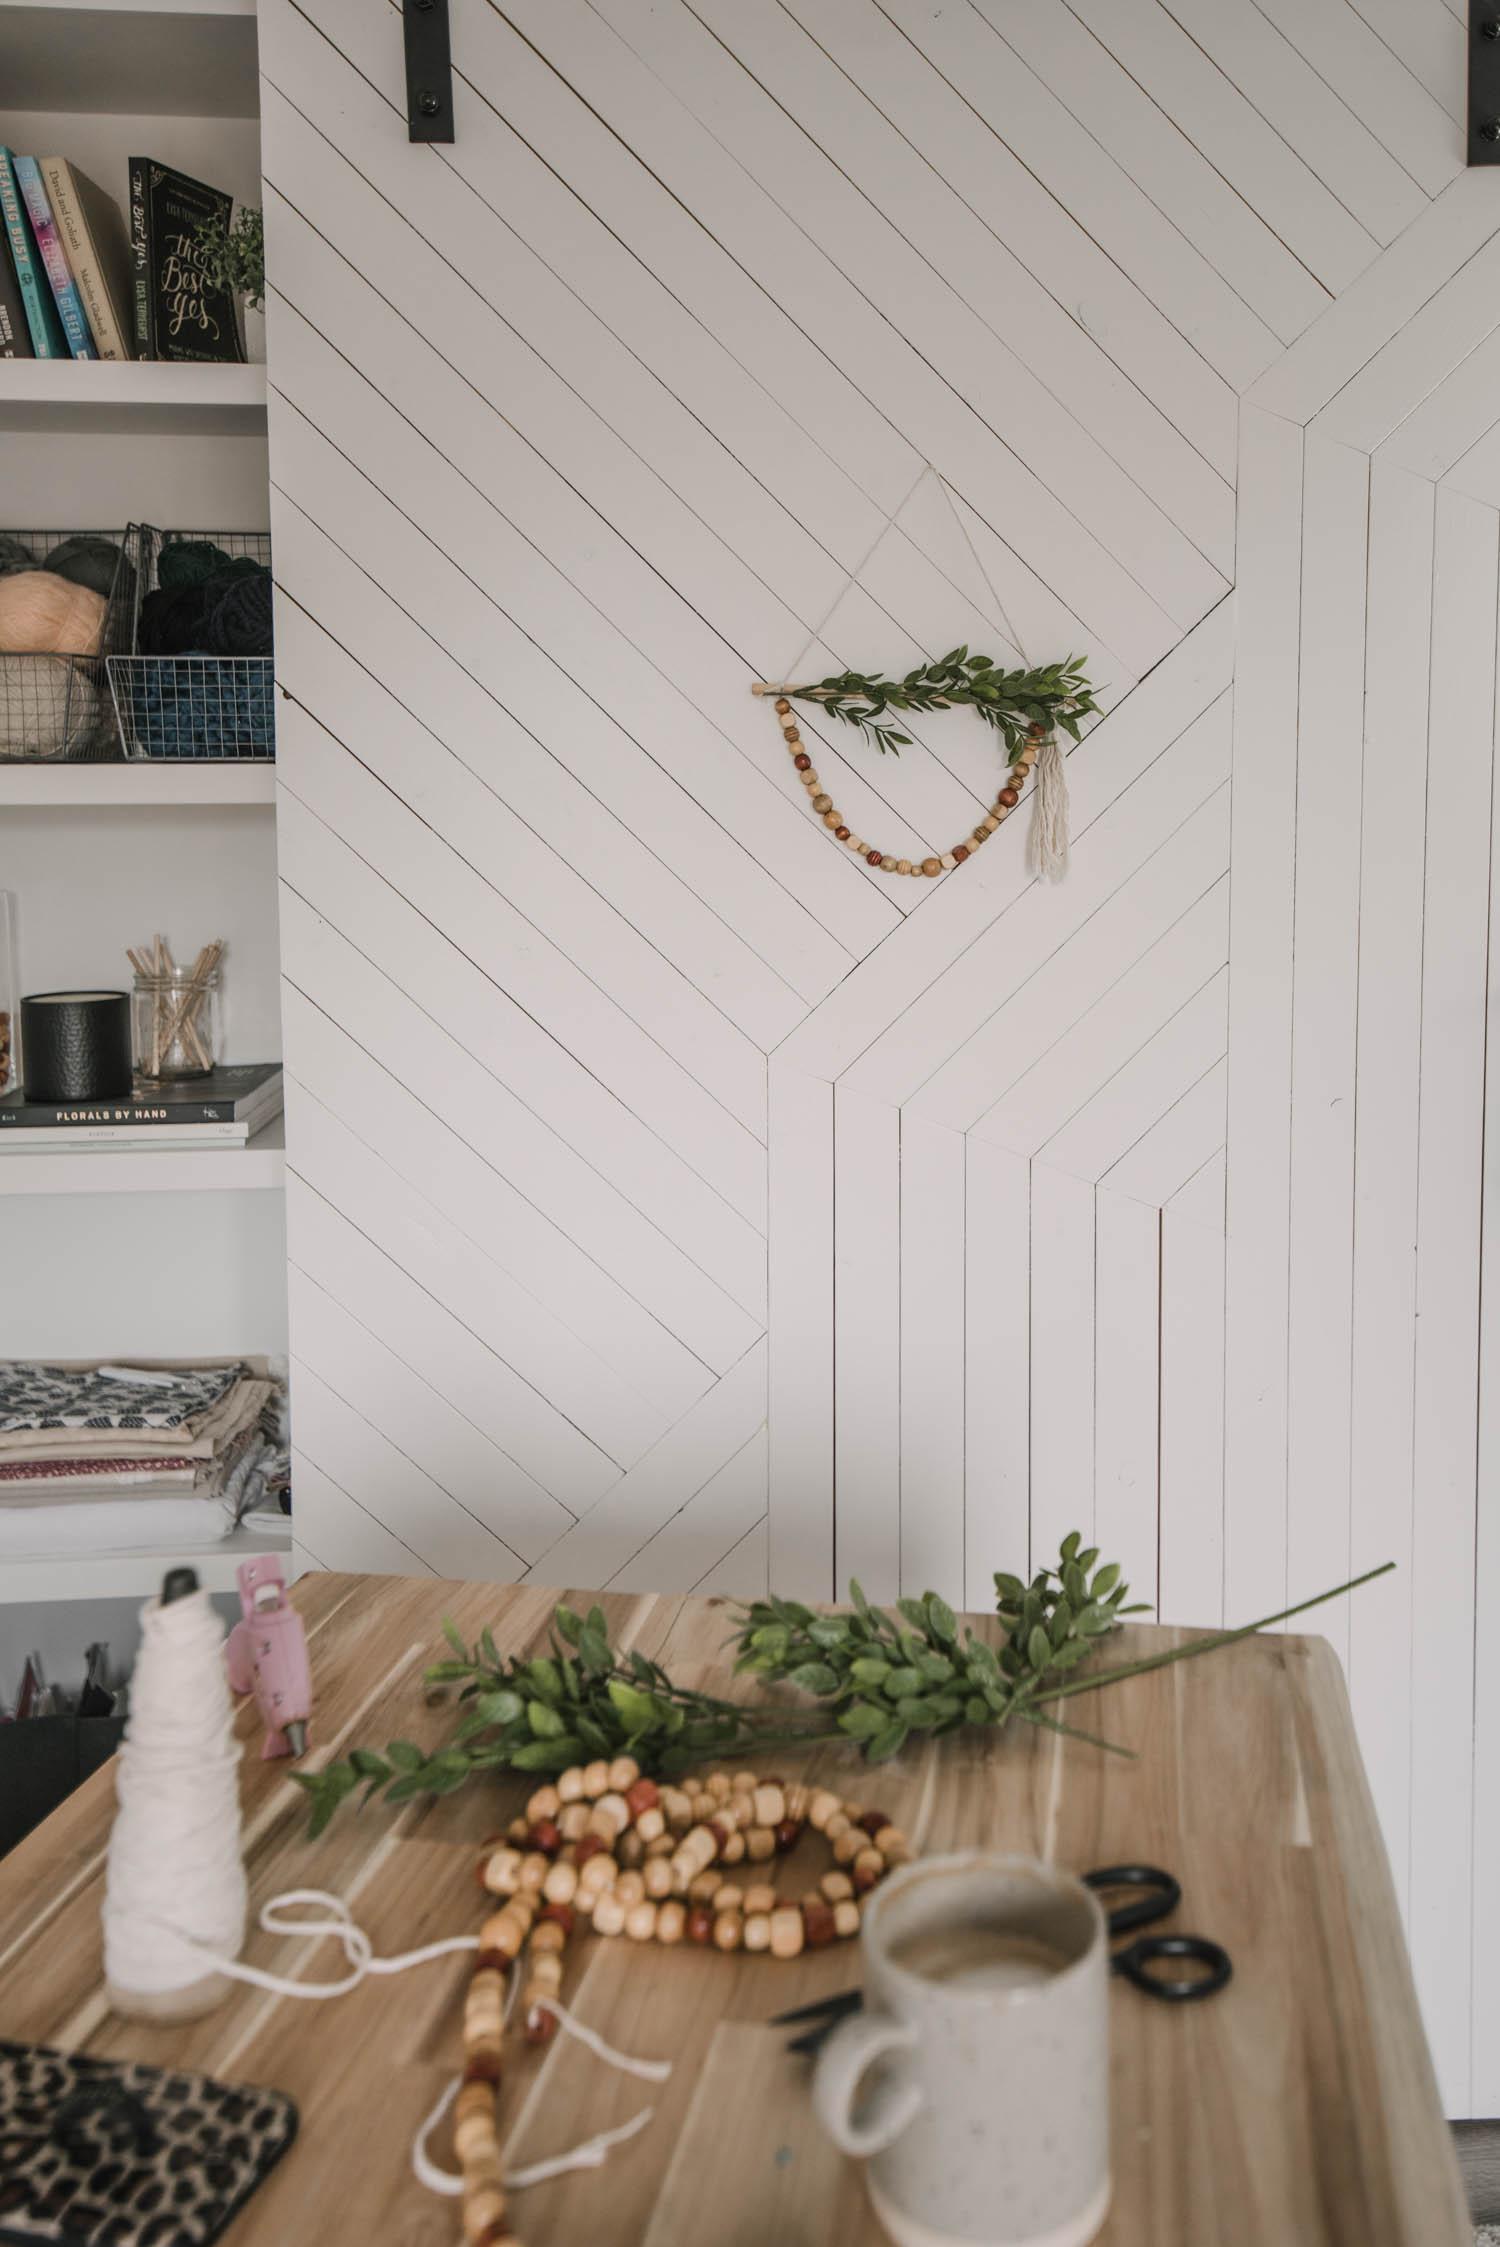 DIY Dollar Store Wreath for Spring- Boho Style